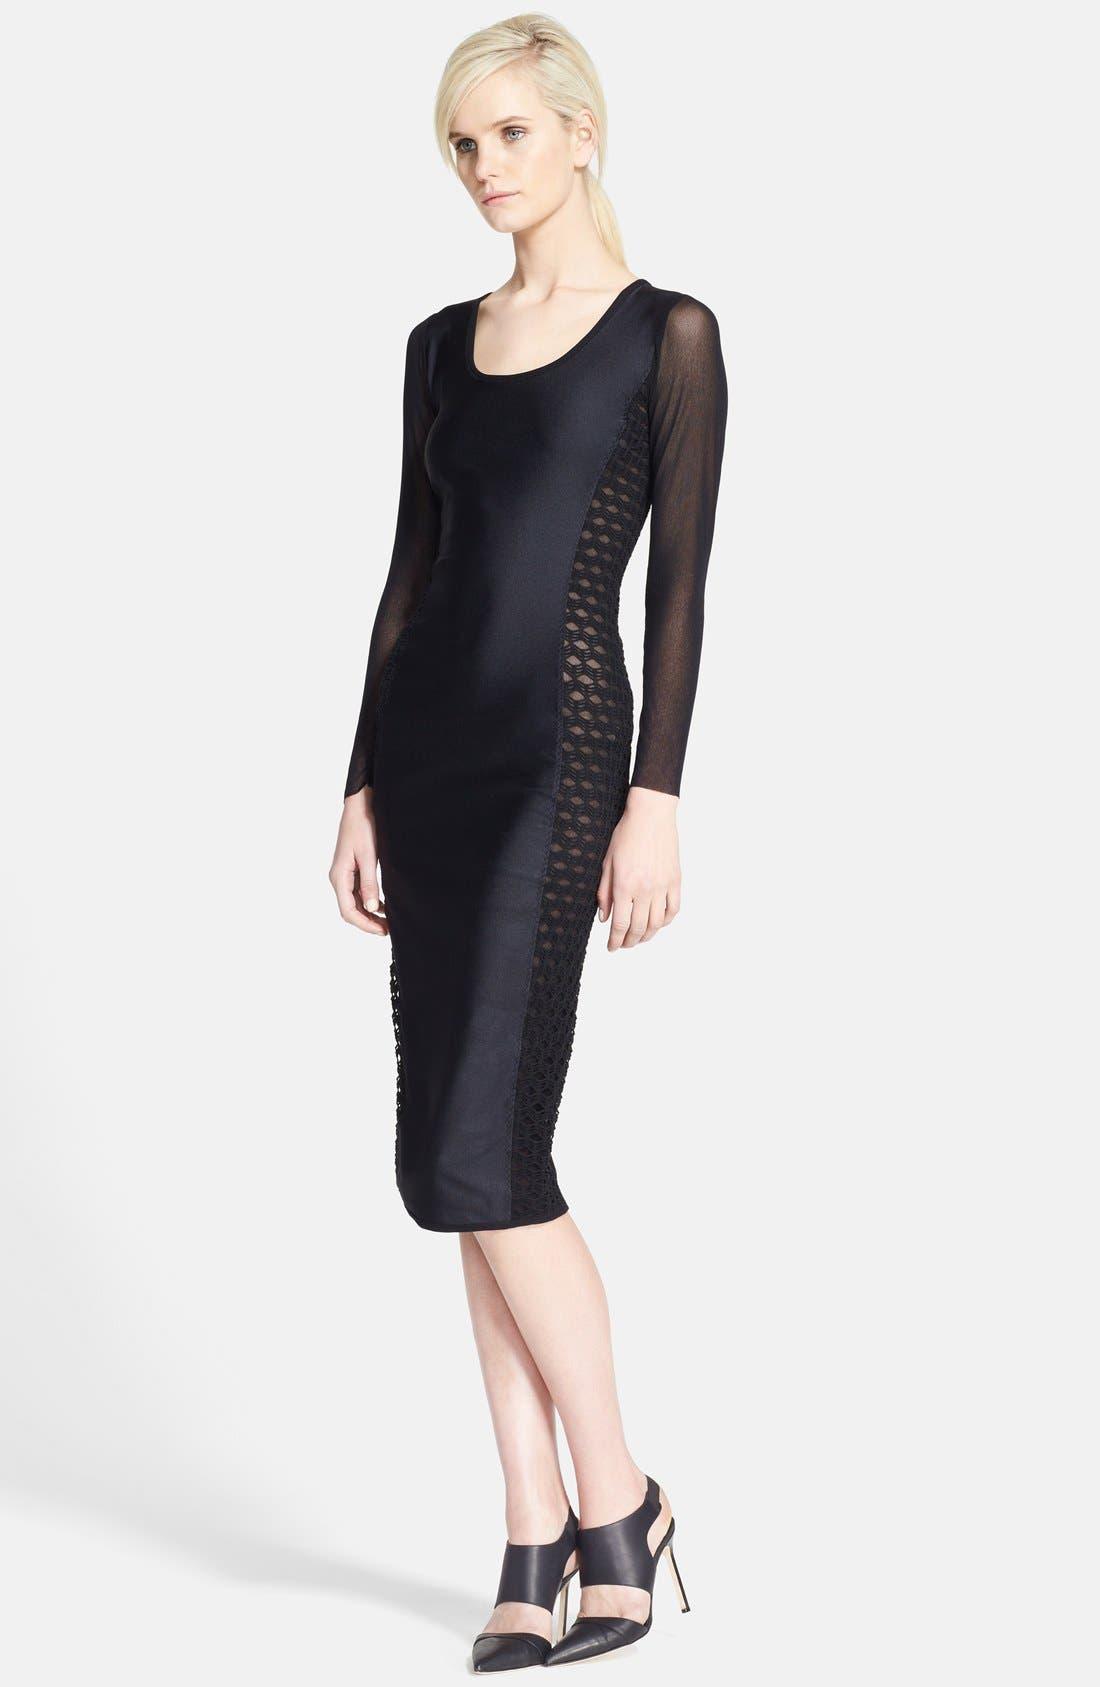 Alternate Image 1 Selected - Jean Paul Gaultier Mixed Media Pencil Dress